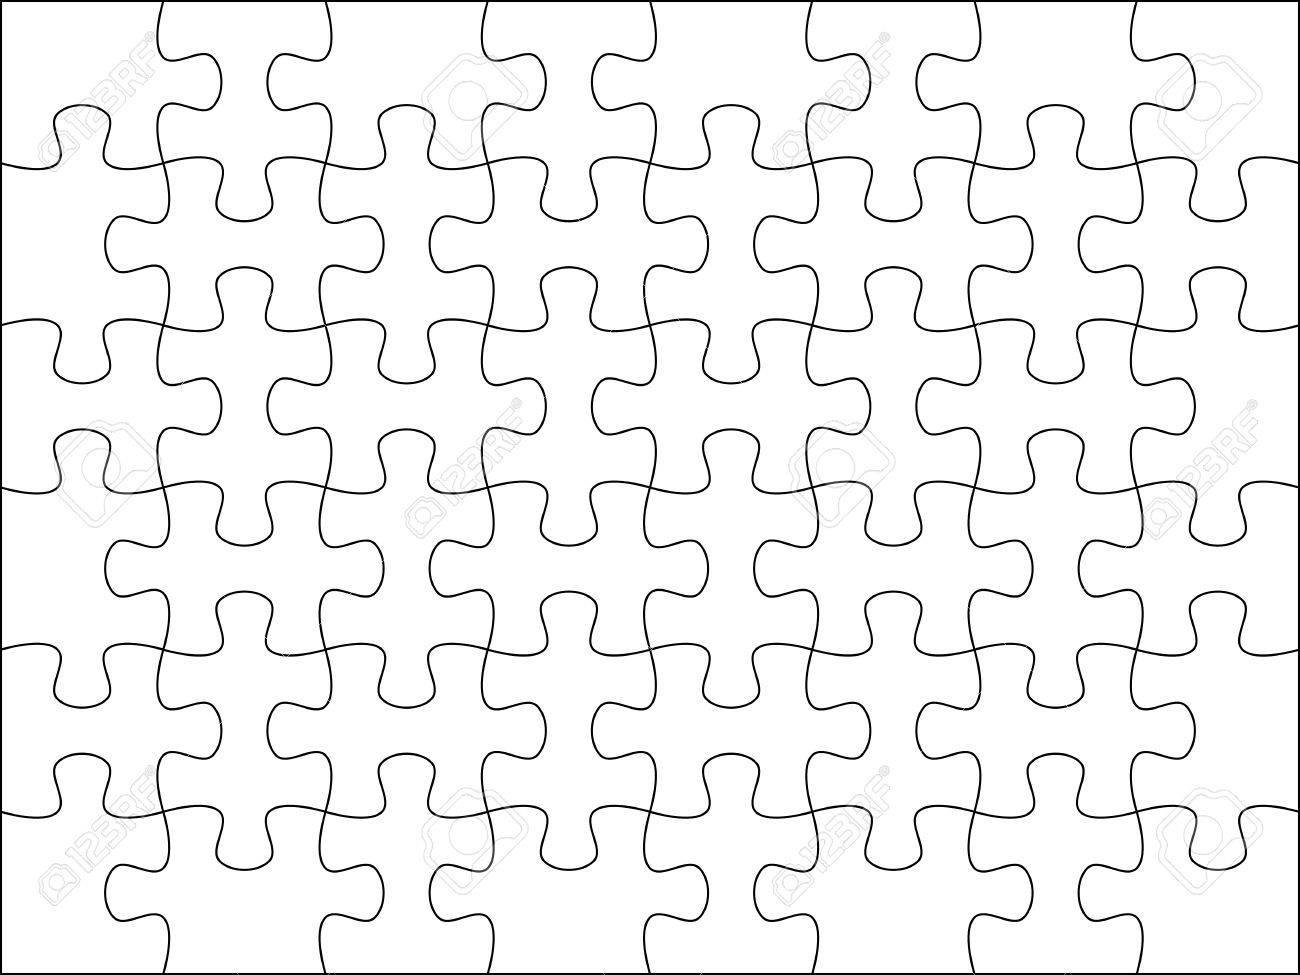 Puzzle De Fondo Plantilla De 8x6 útil Para La Foto De ...